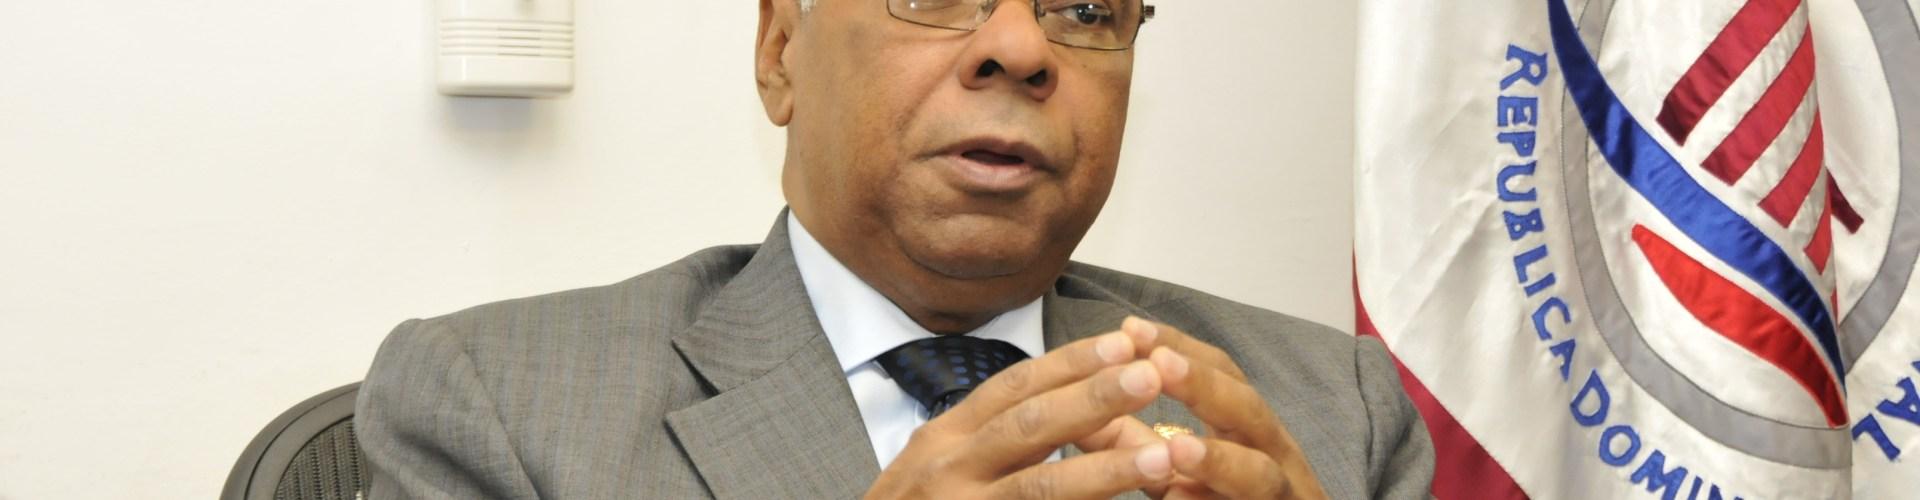 Tribunal Constitucional cita meta próximo año